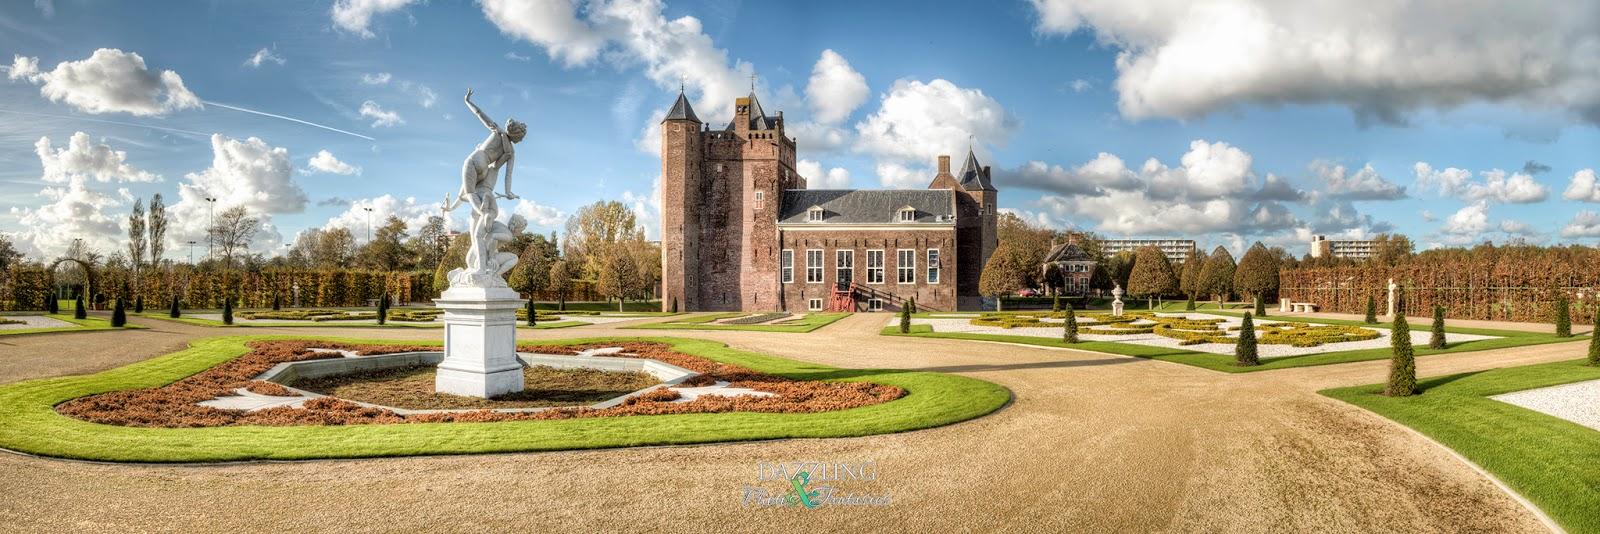 slot Assumburg in Heemskerk